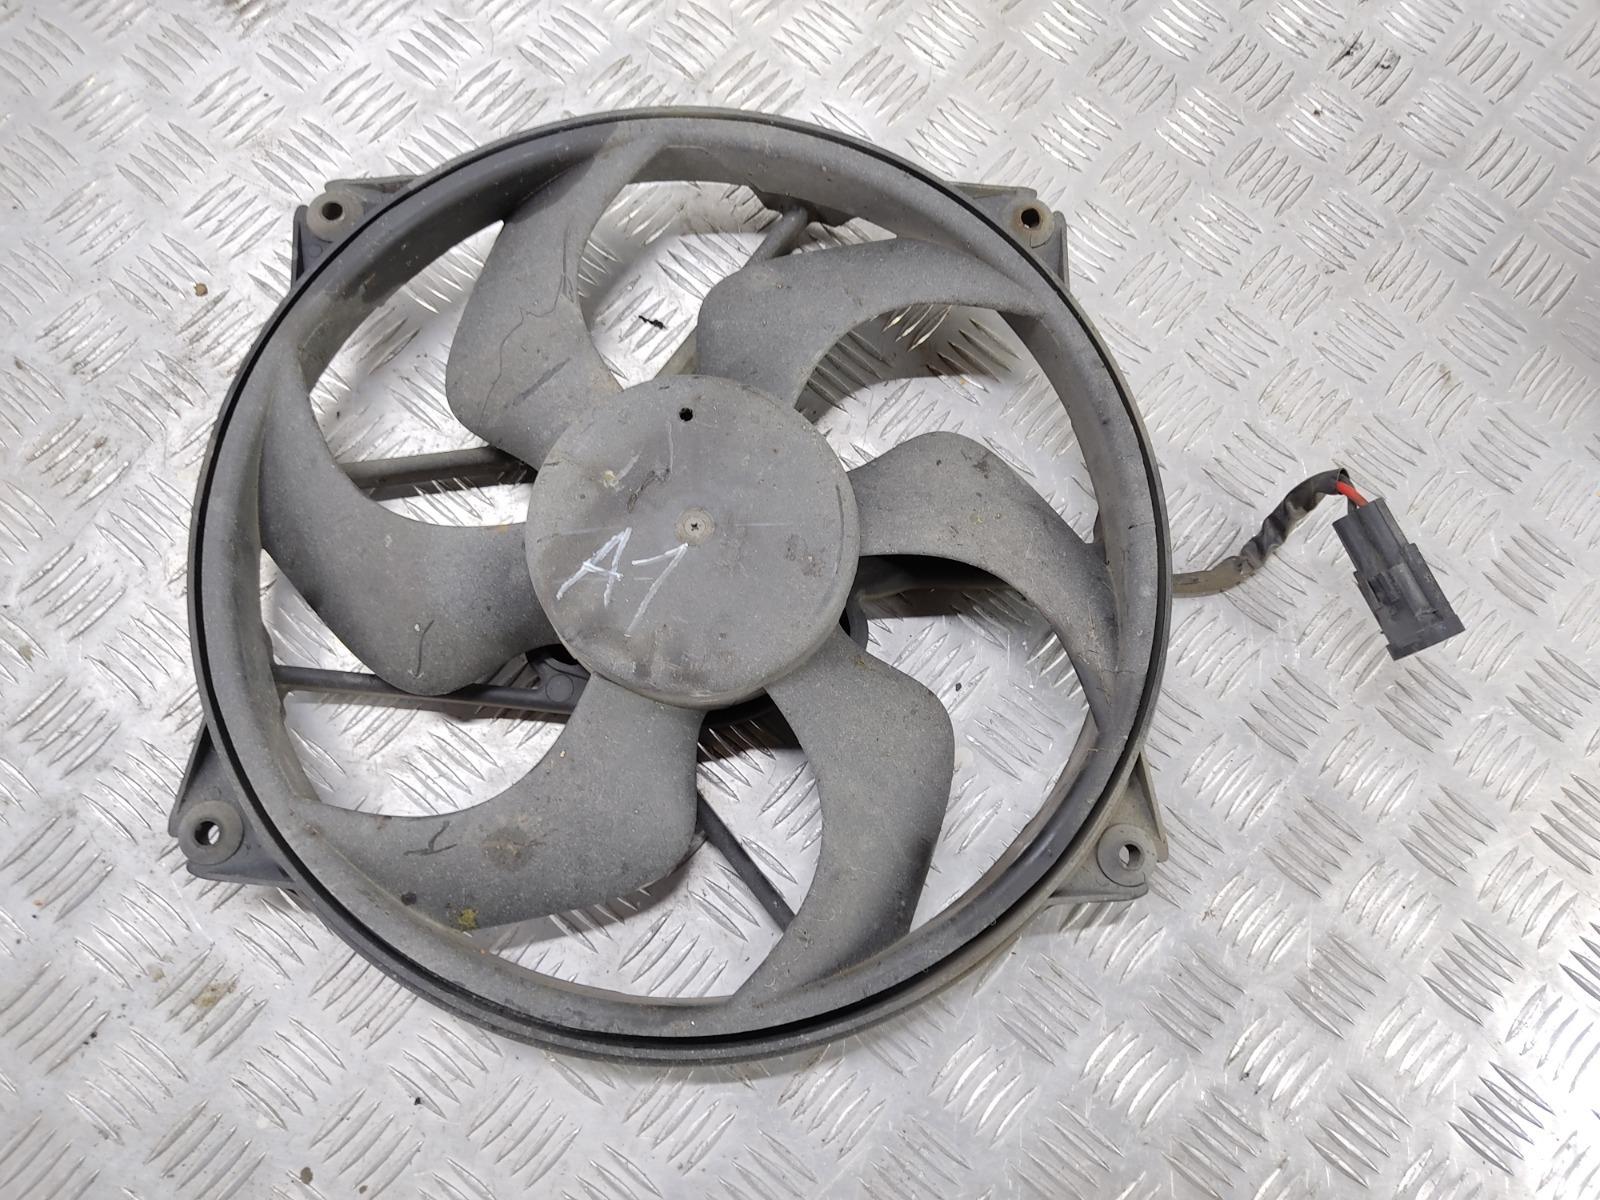 Вентилятор радиатора Citroen C4 1.6 I 2005 (б/у)